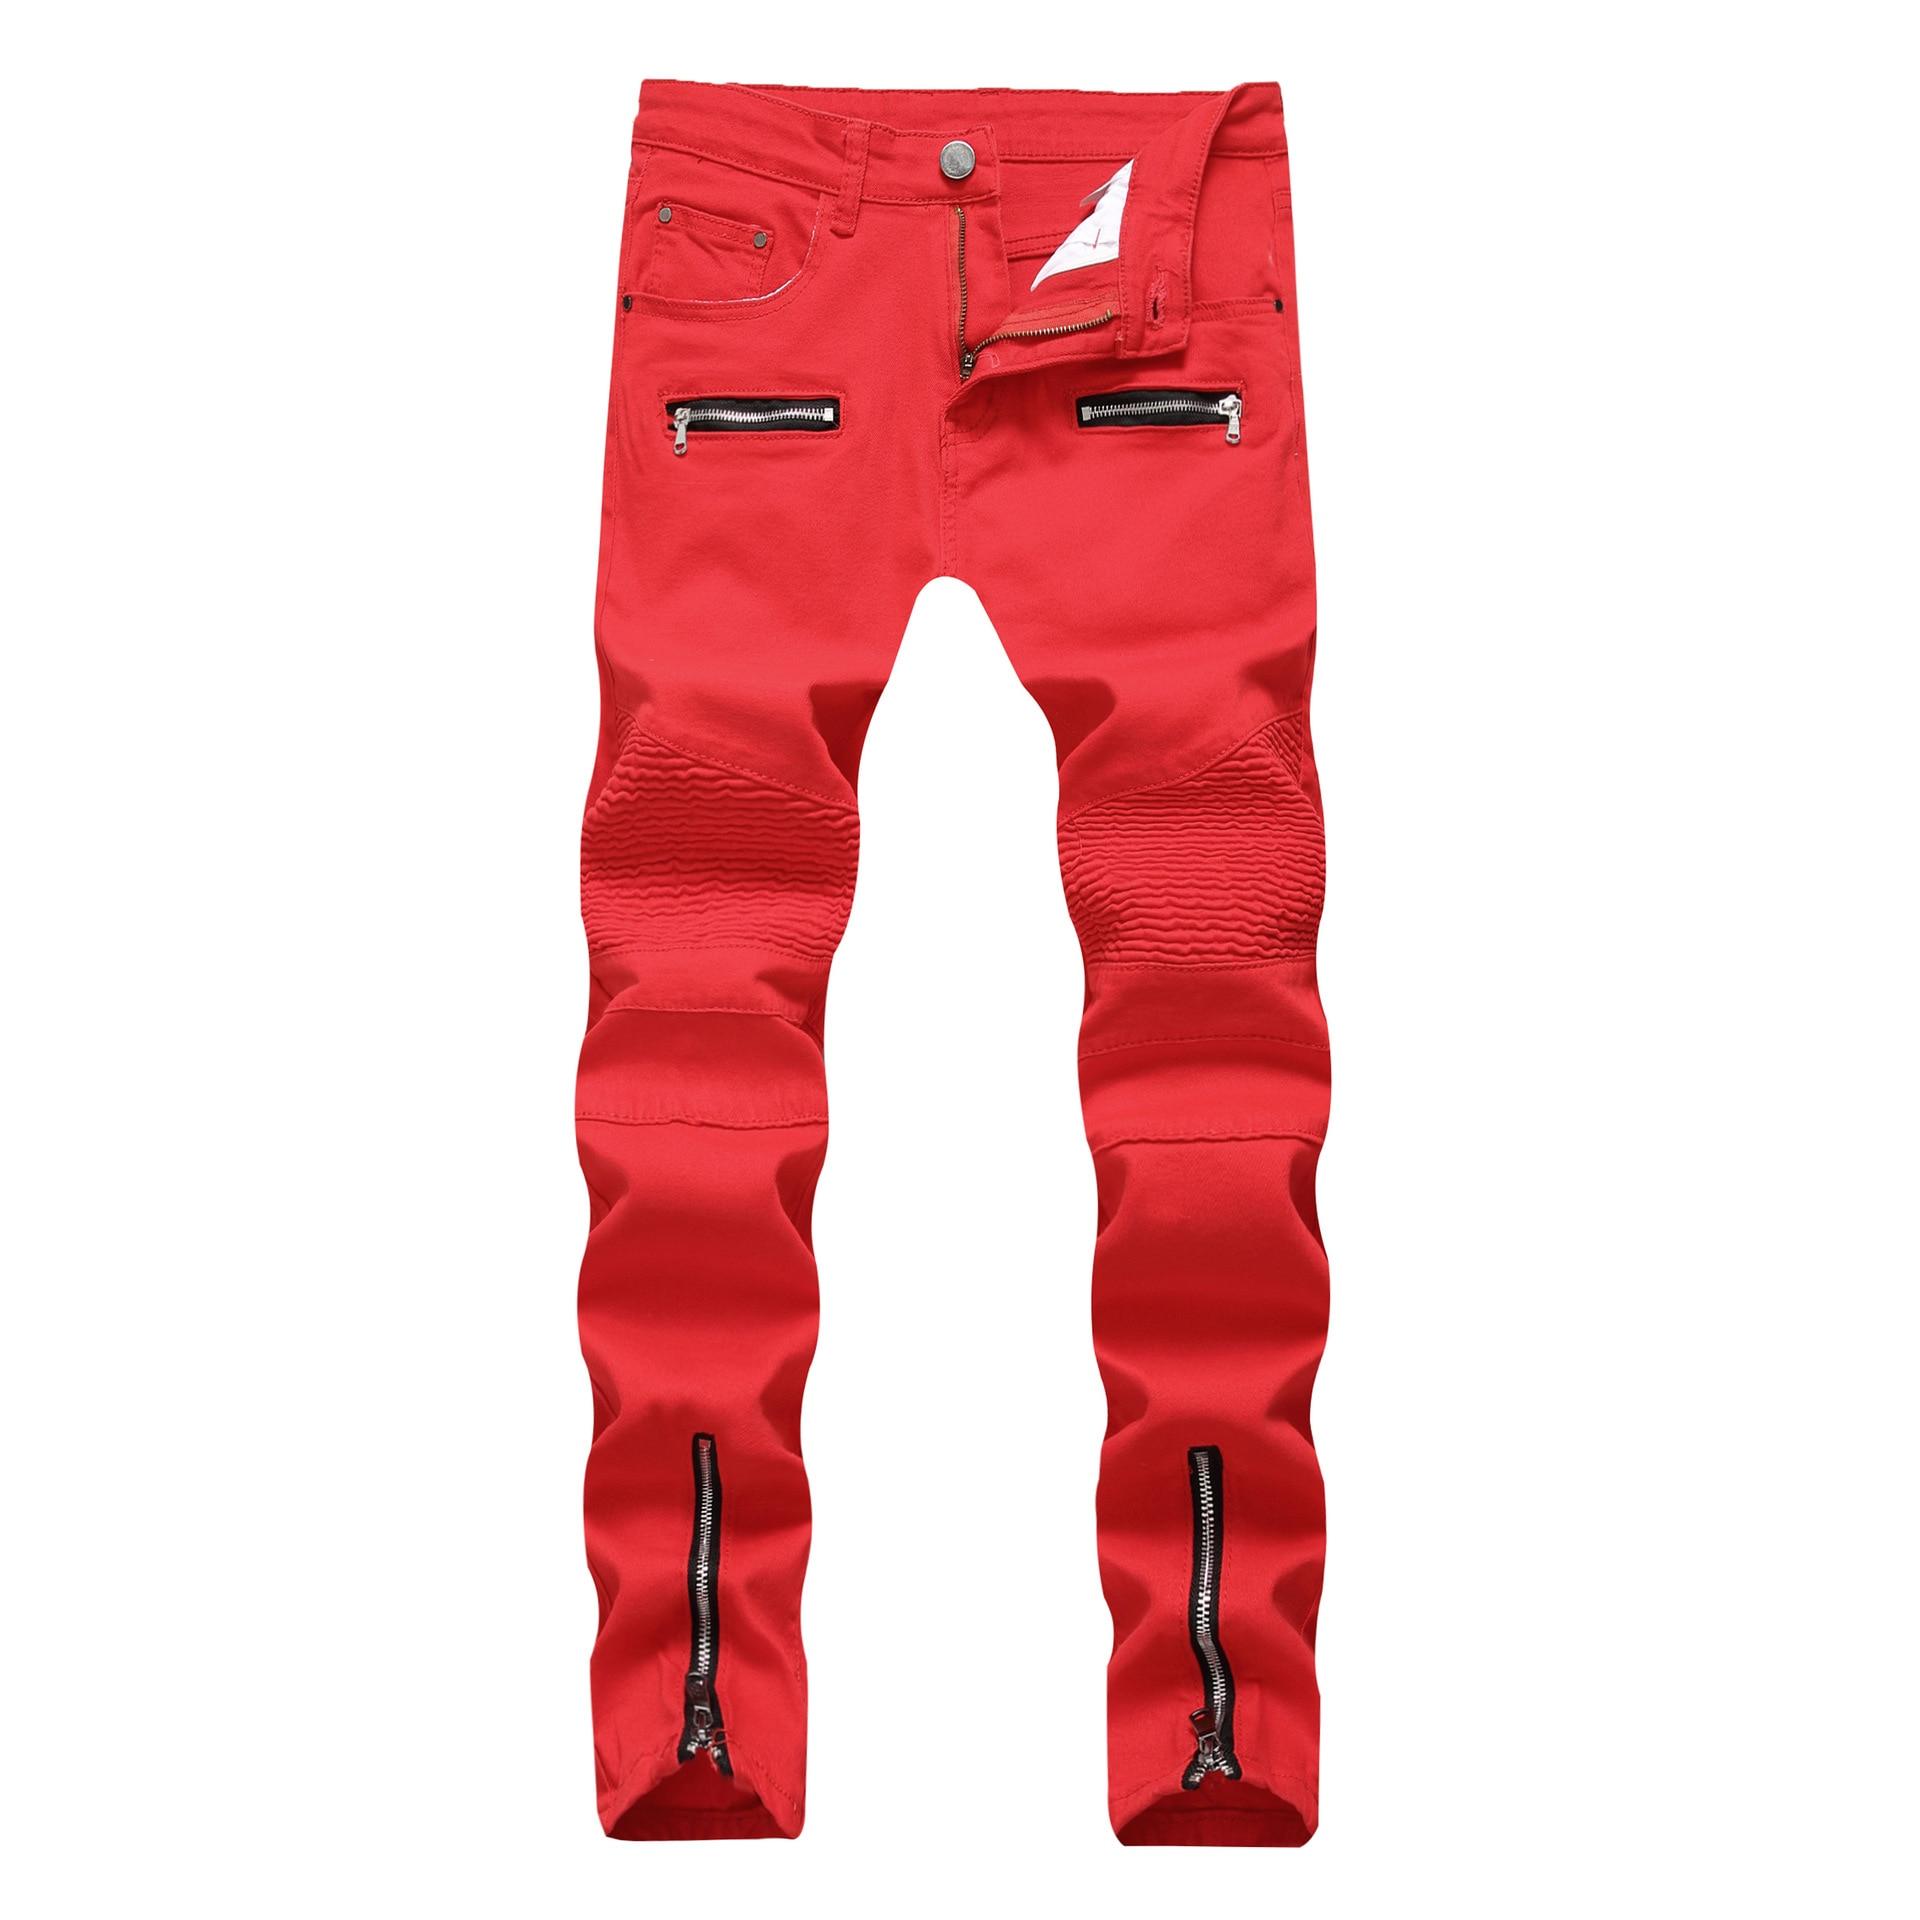 New Brand Black Biker Jeans For Men Denim Ripped Skinny Jeans Mens Slim Straight Patchwork Jean Male Brand Moto Jeans Hombre